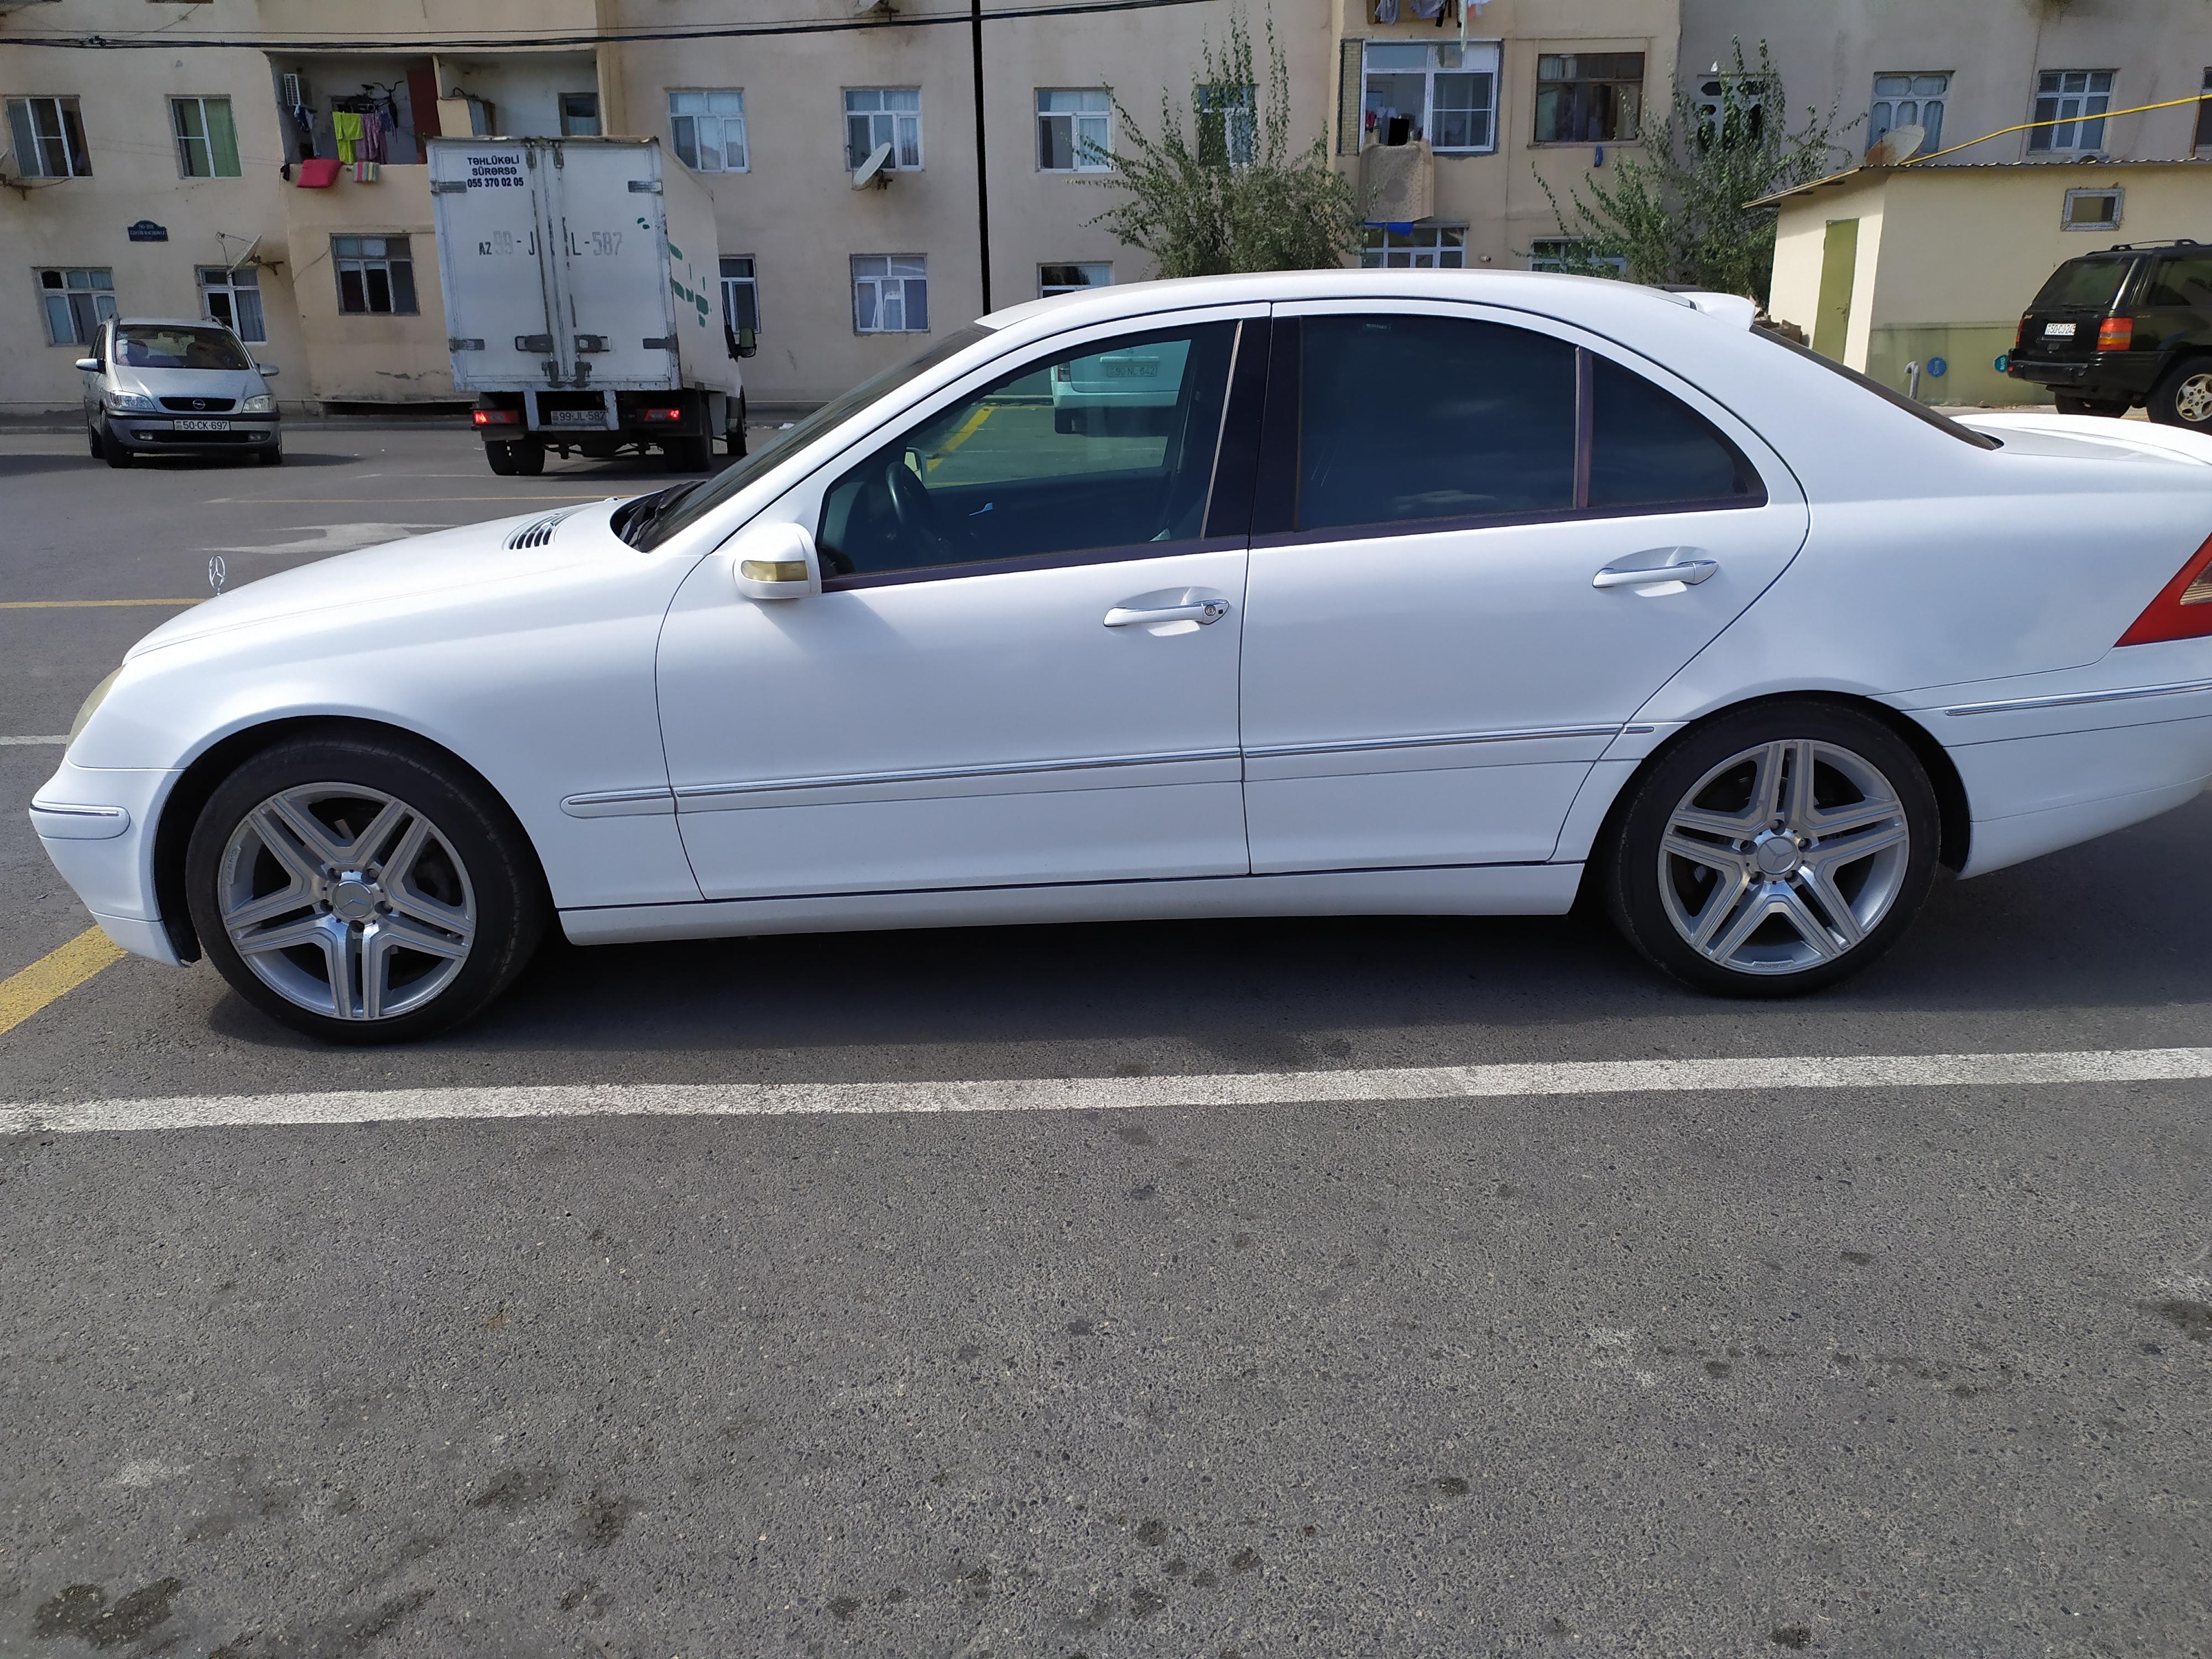 Mercedes-Benz C 200 2.0(lt) 2000 İkinci əl  $11500